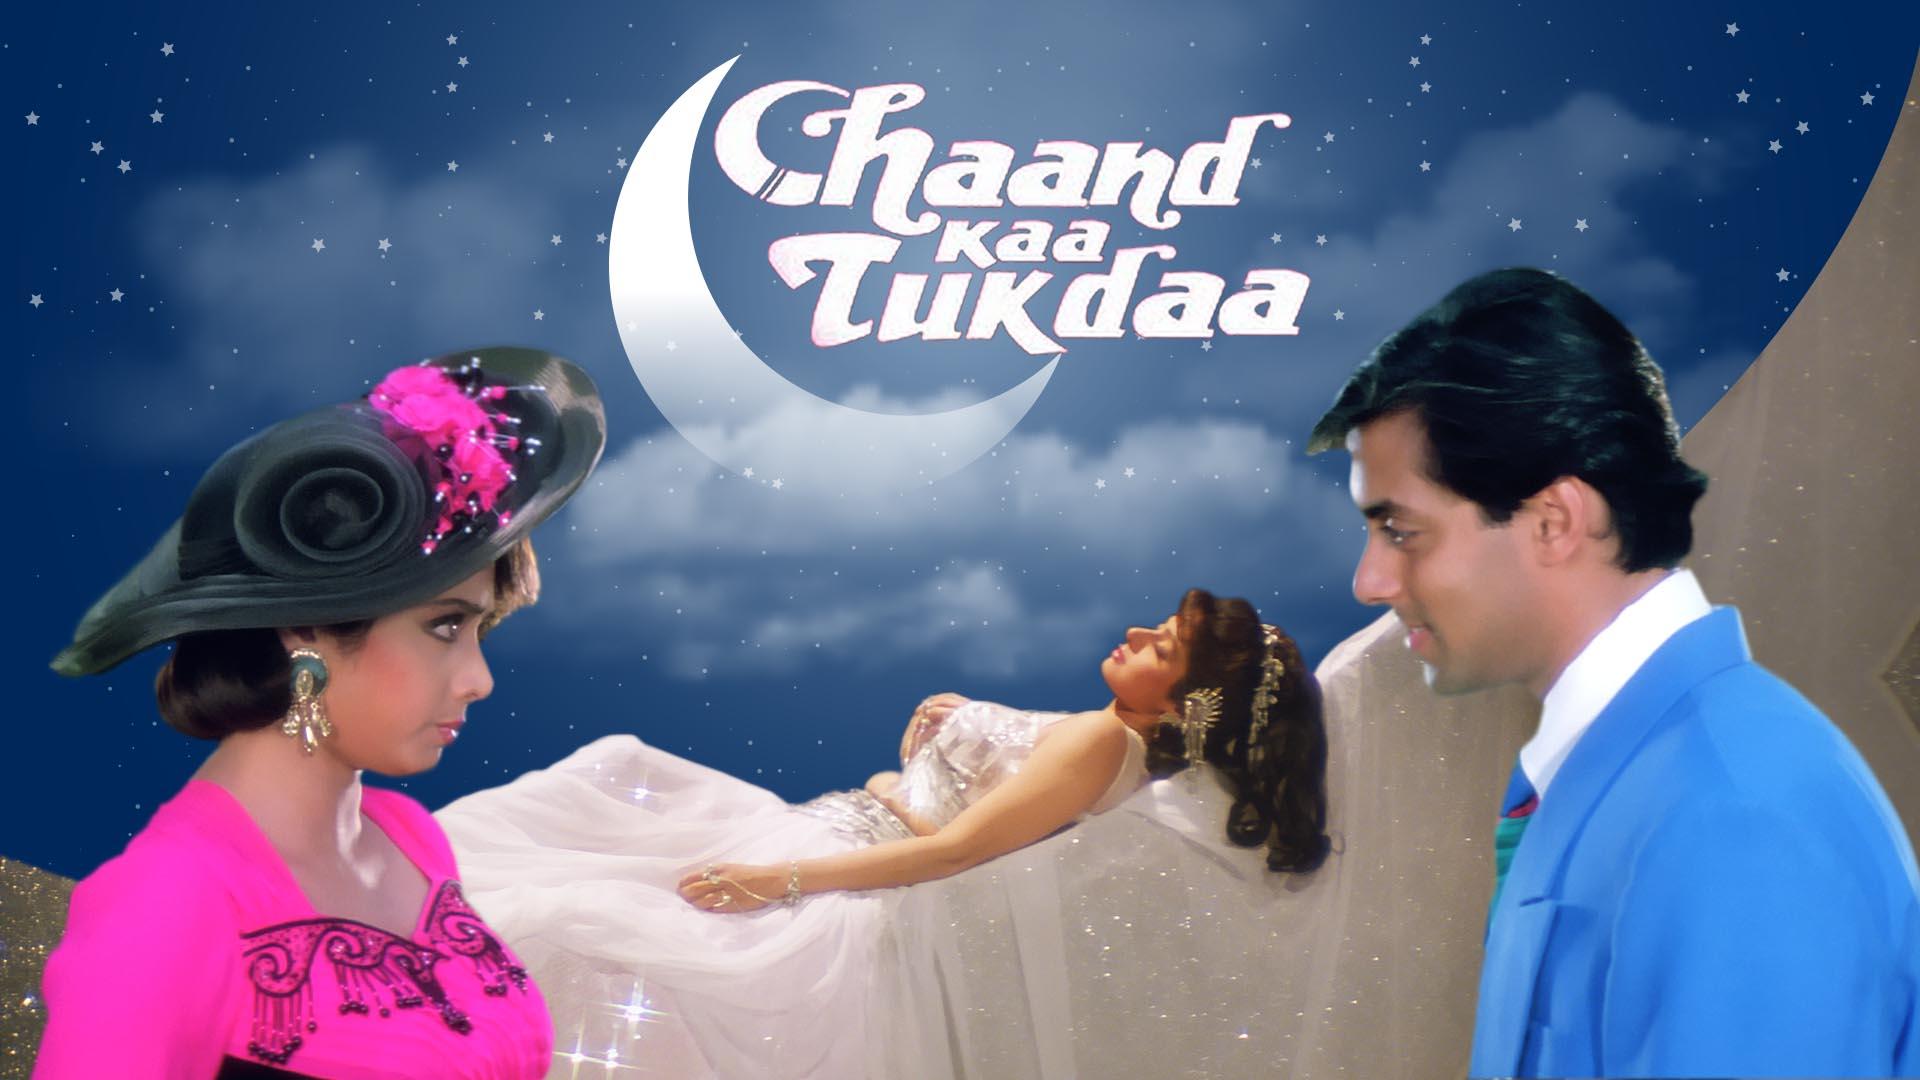 Chaand Ka Tukda